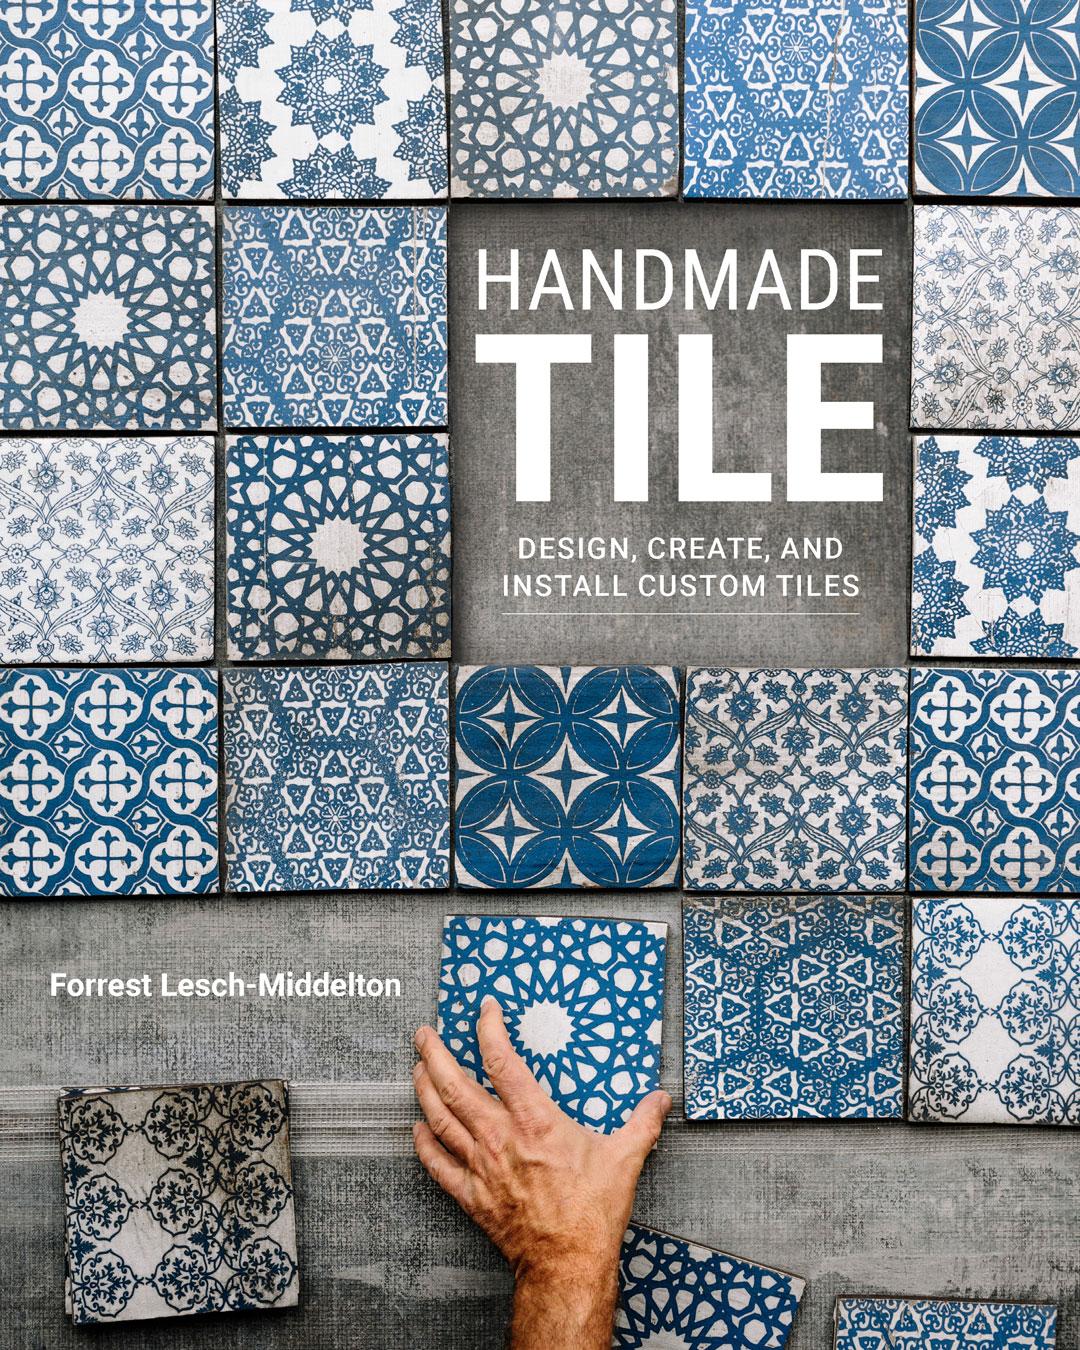 Handmade Tile, Forrest Lesch-Middleton book about feature tiles